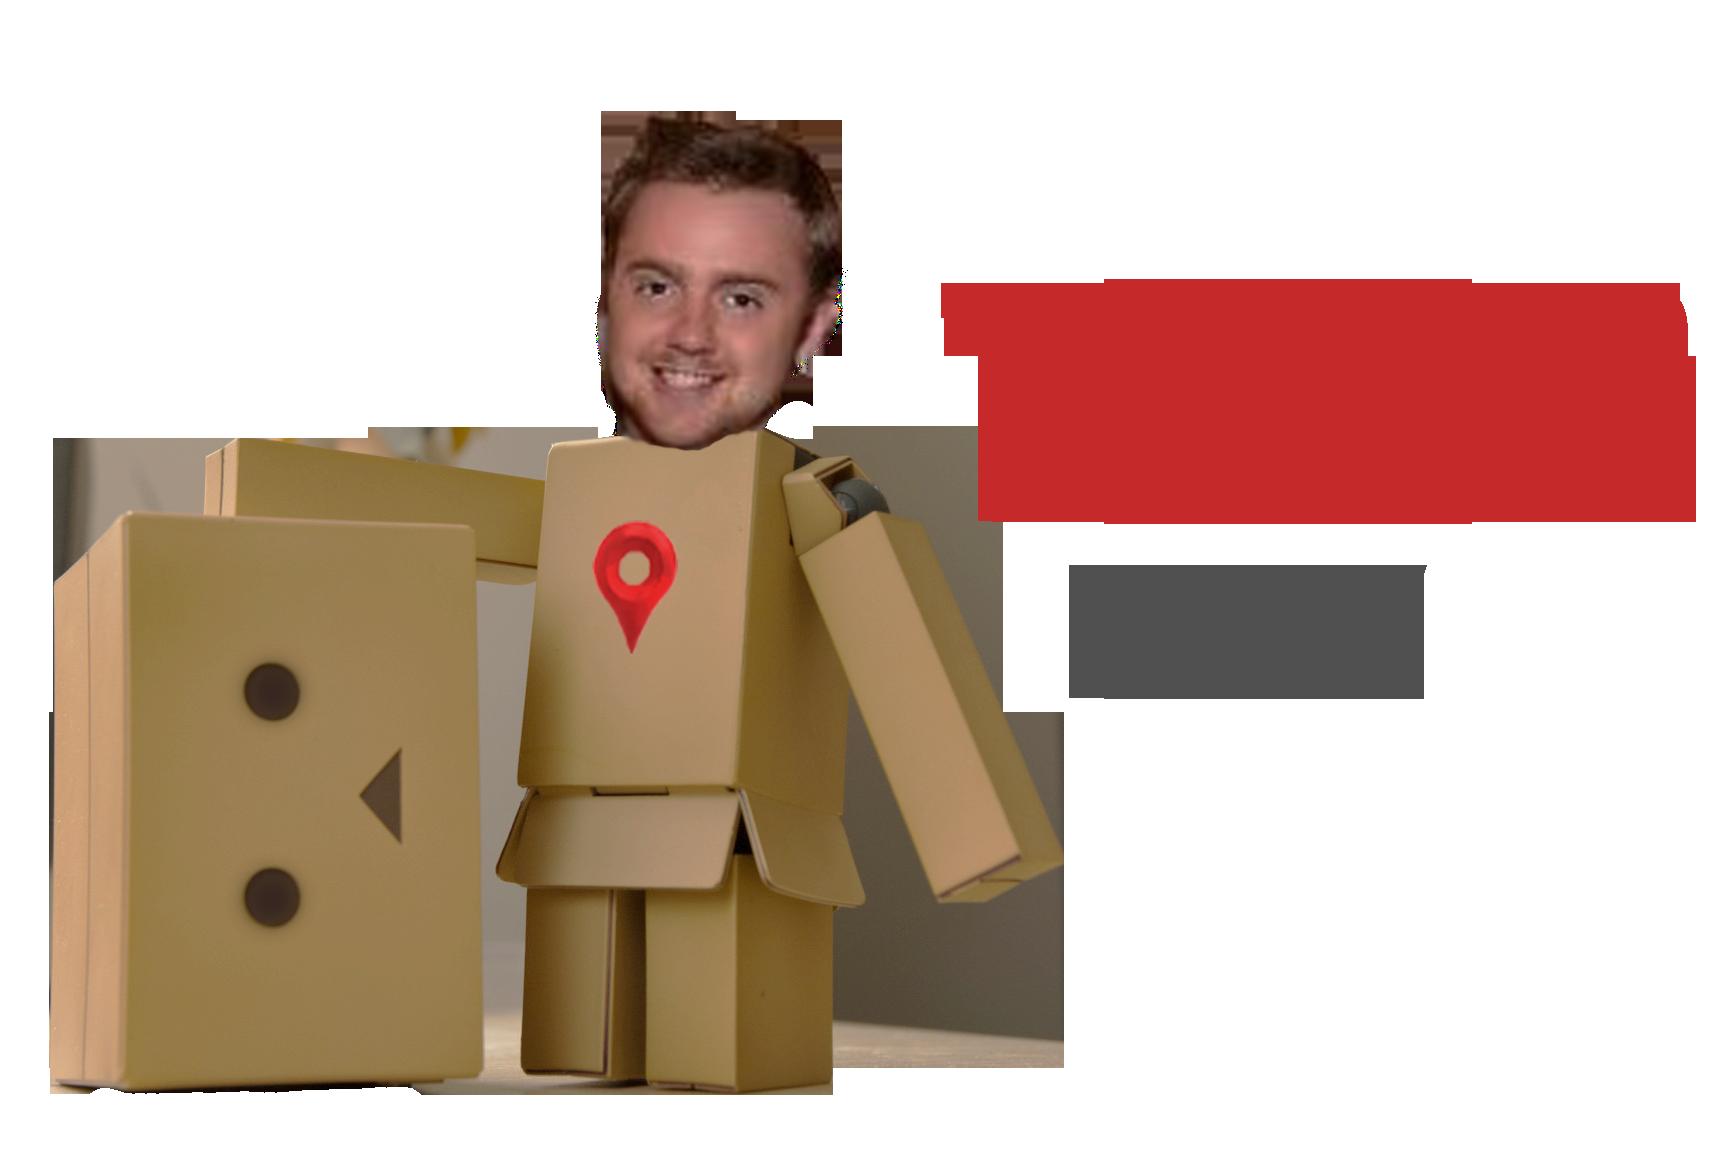 ProBotTuckerBrady